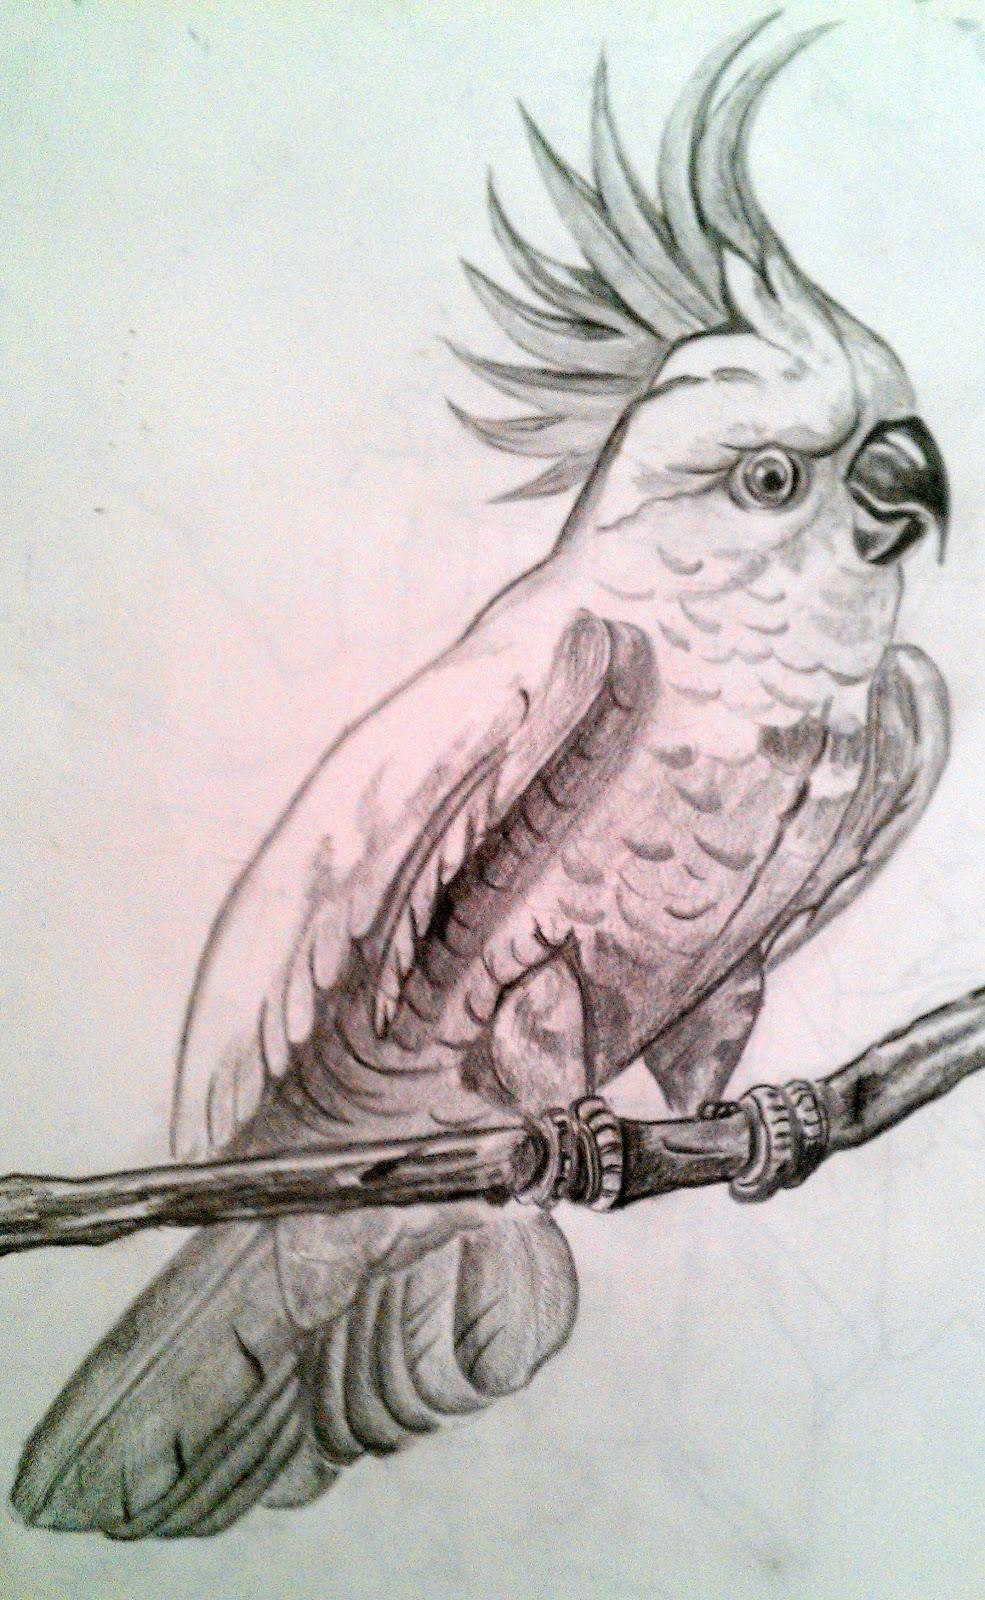 reshmi's art: my latest bird potraits in pencil